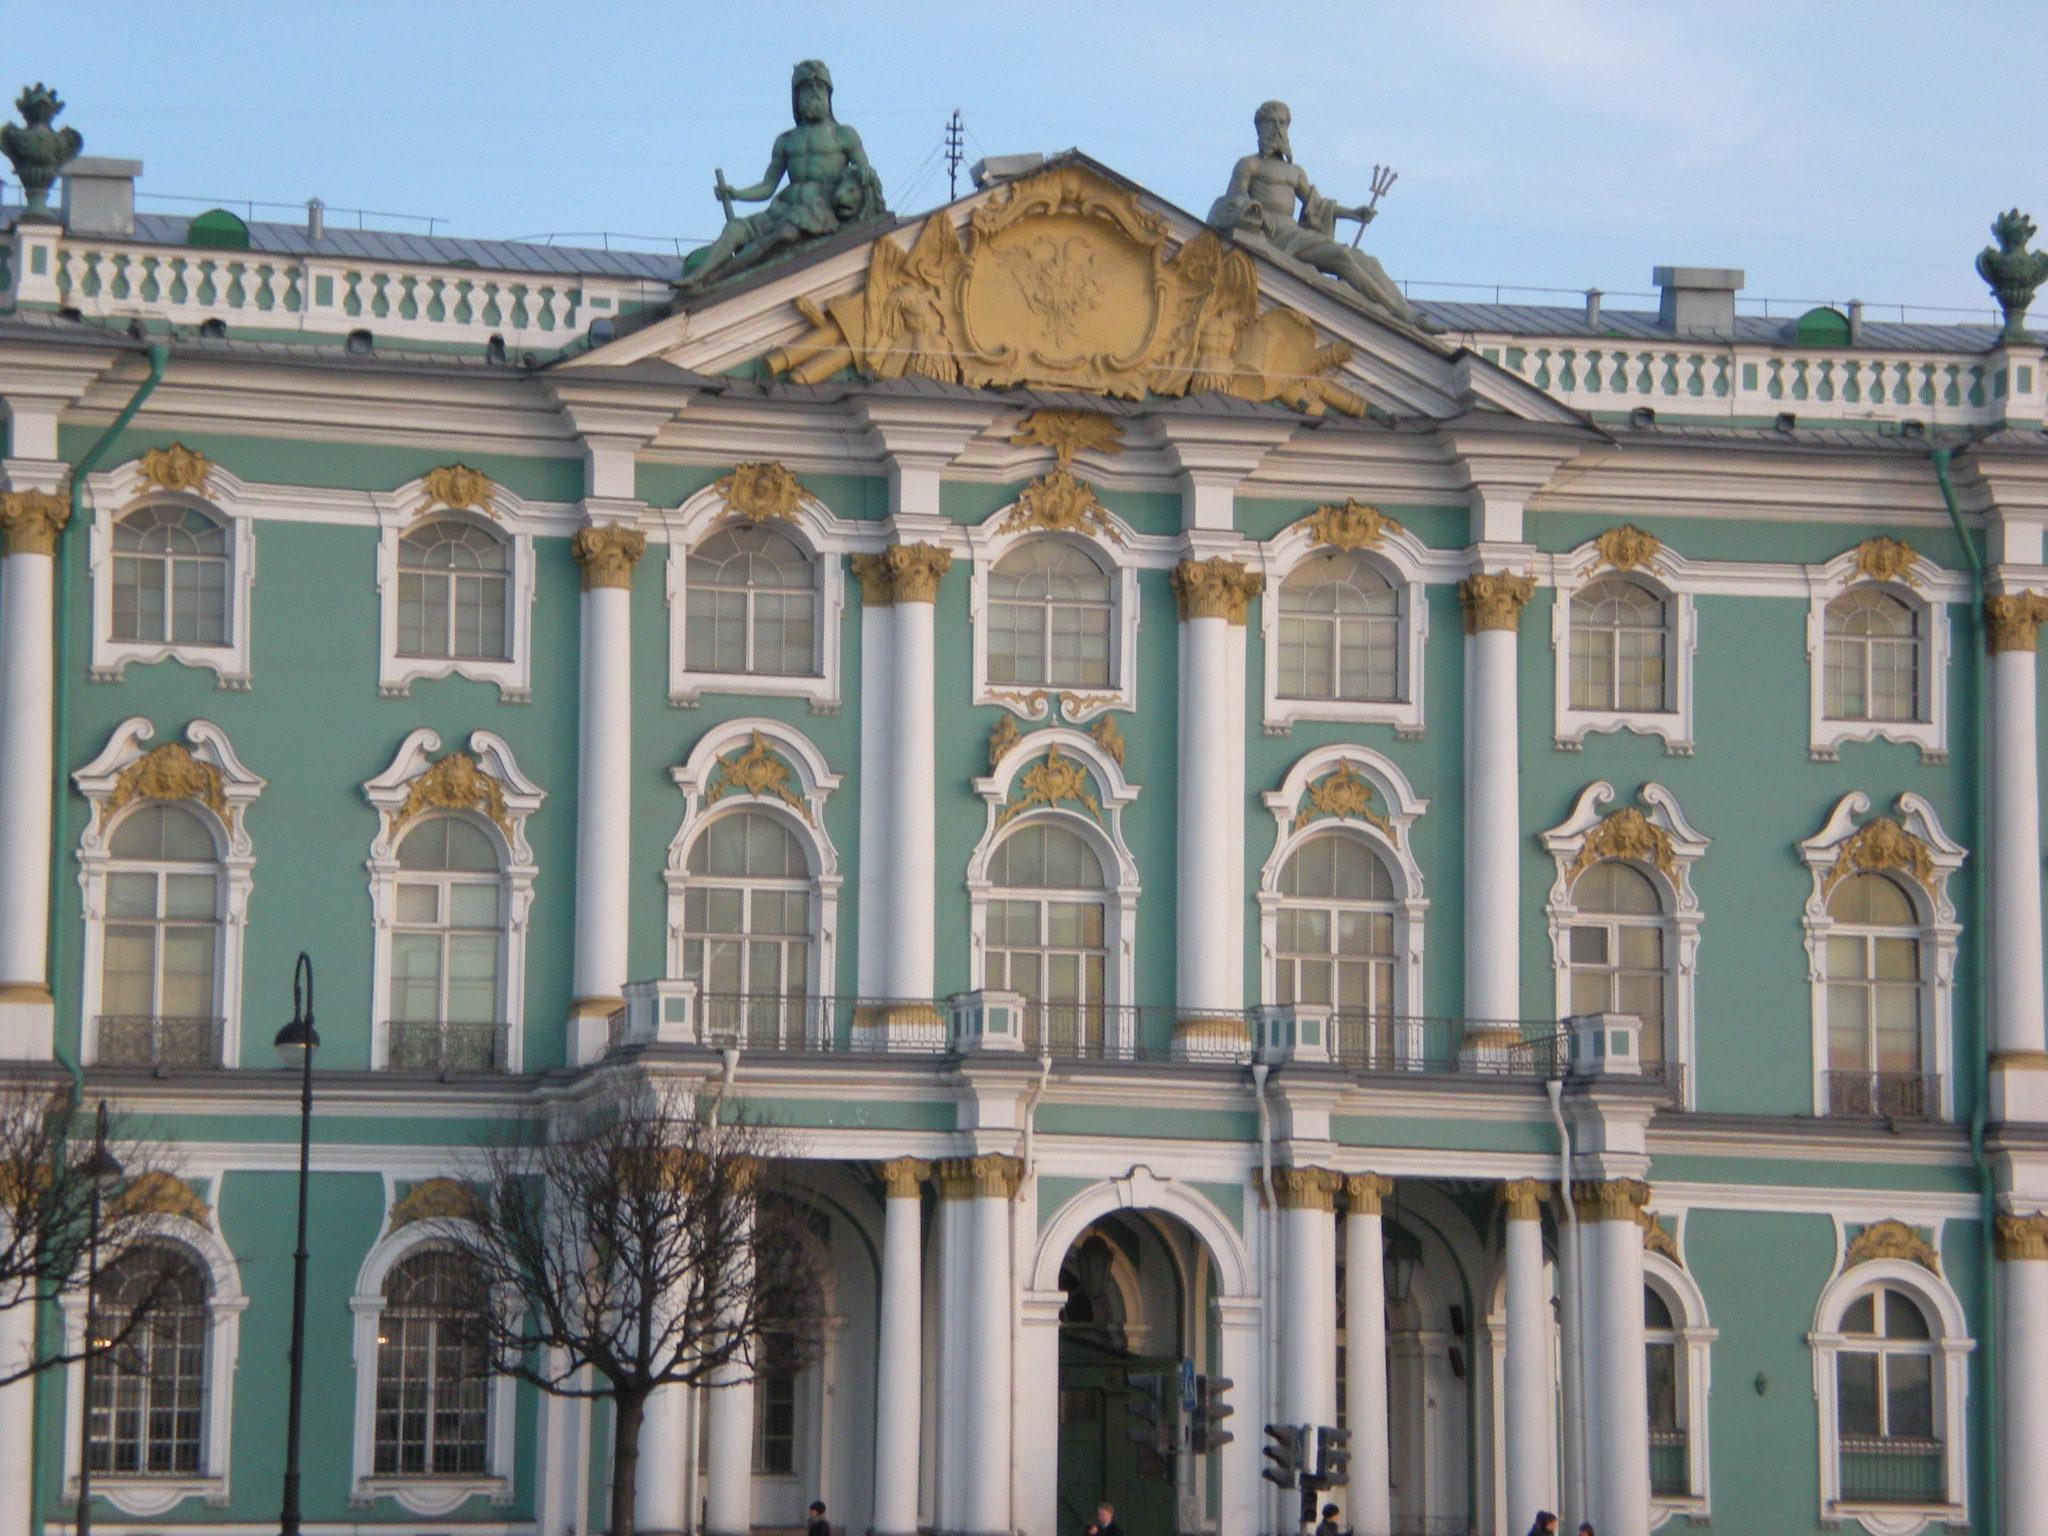 Winter_Palace_-_Hermitage,_St-_Petersbur